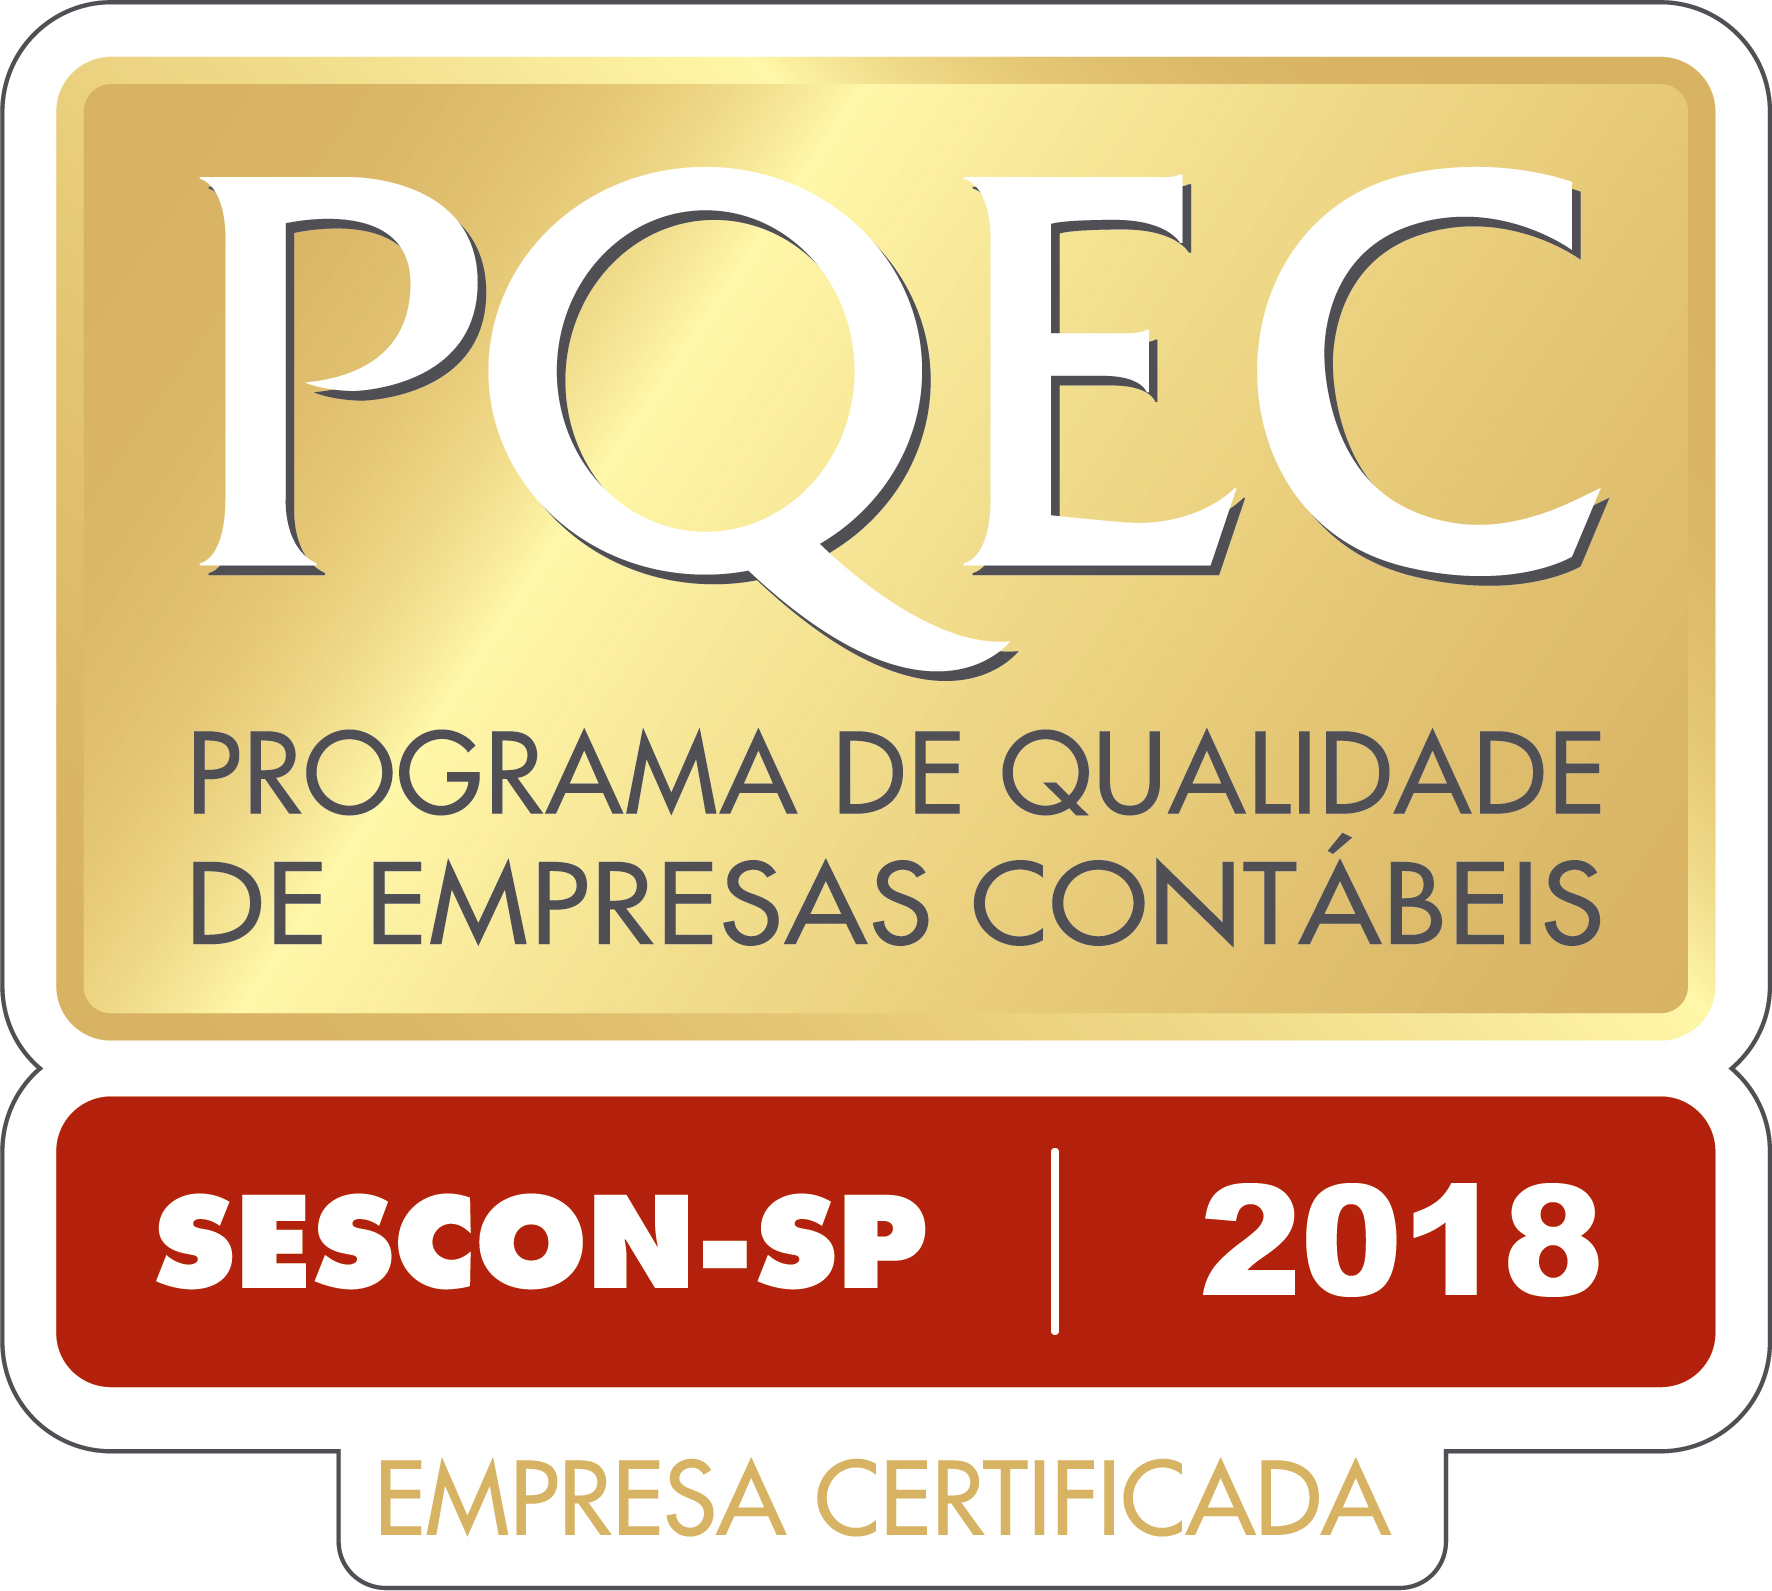 Selo PQEC 2018